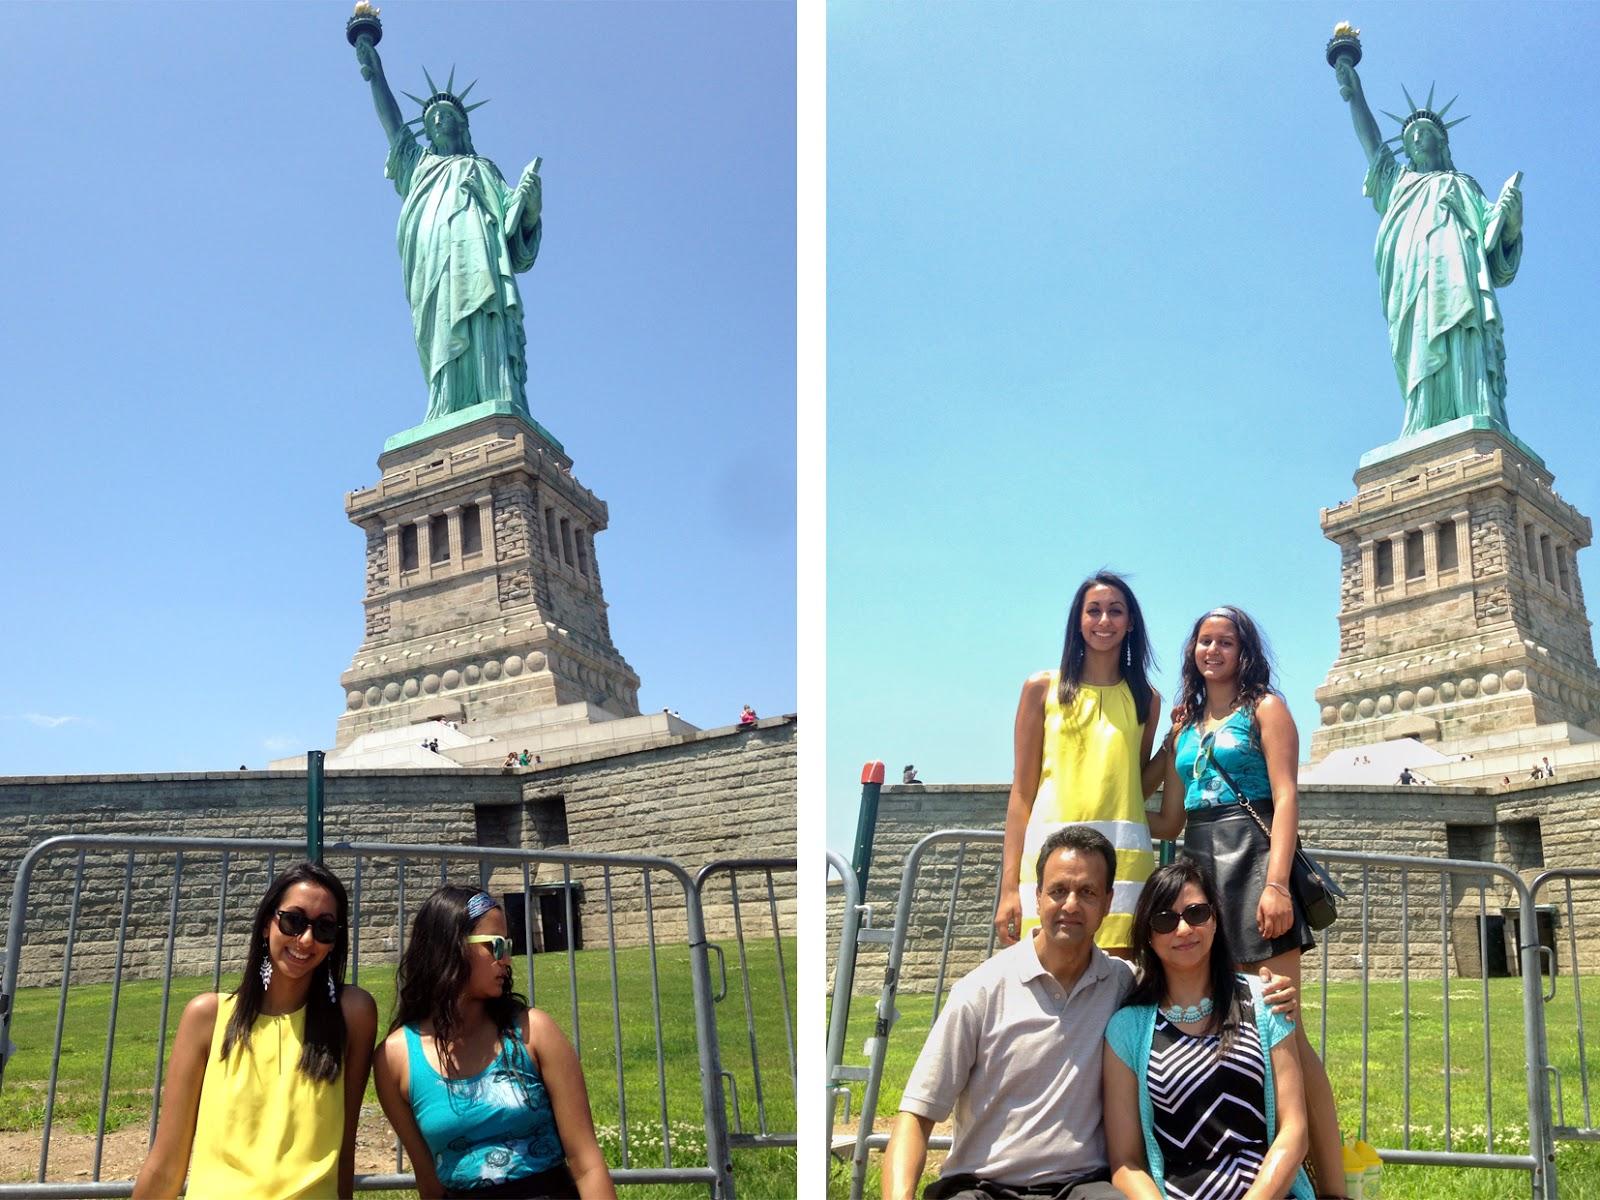 Statue%2Bof%2BLiberty.jpg